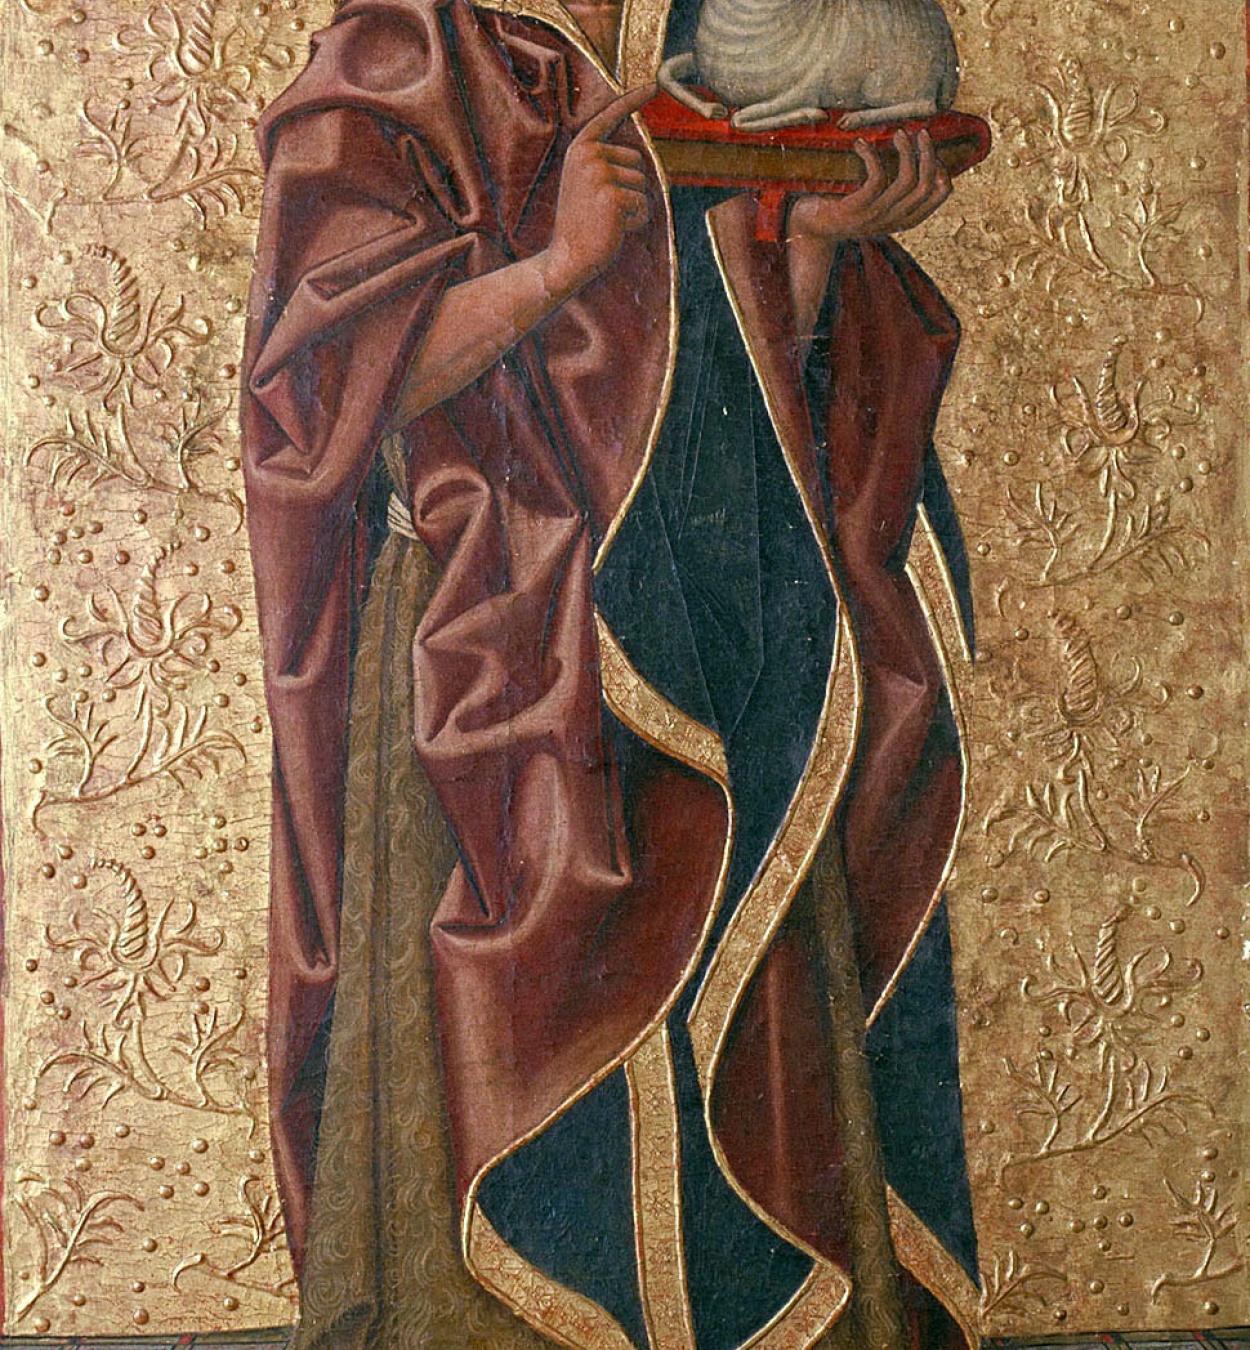 Juan de la Abadía (el Vell) - Saint John the Baptist - Last quarter of the 15th century